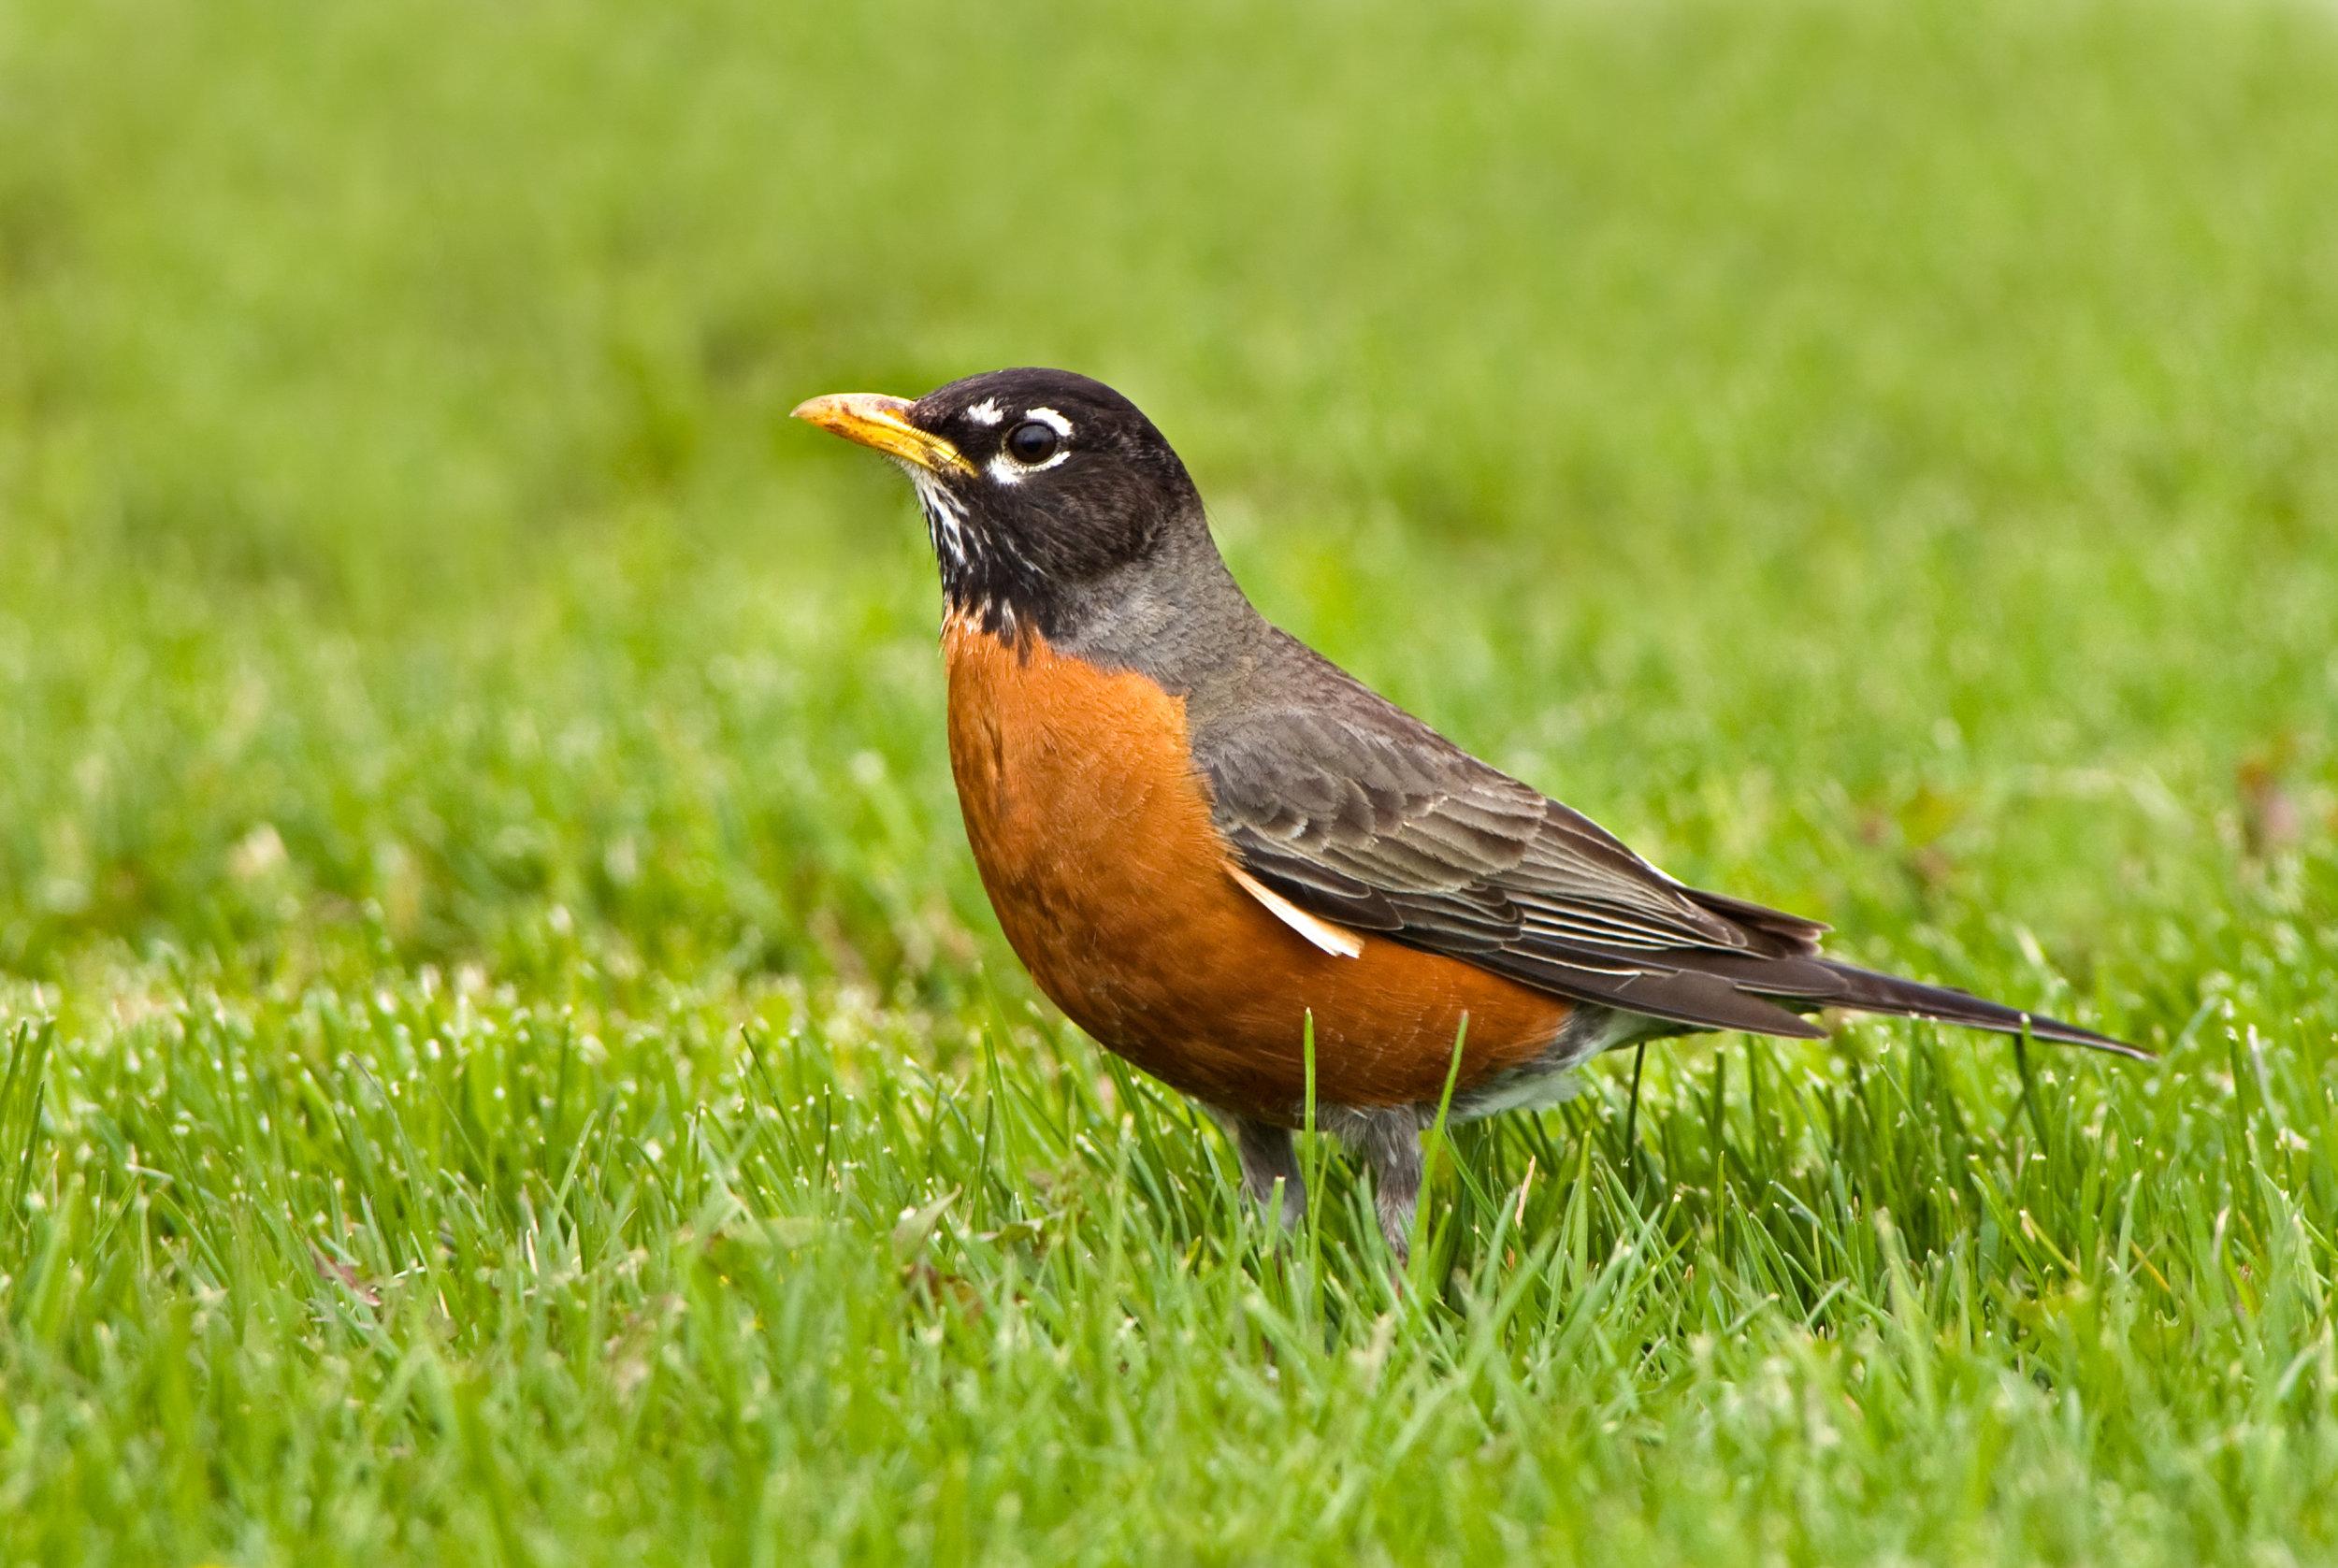 American-Robin-in-Spring-grass-92373688_2588x1736.jpg